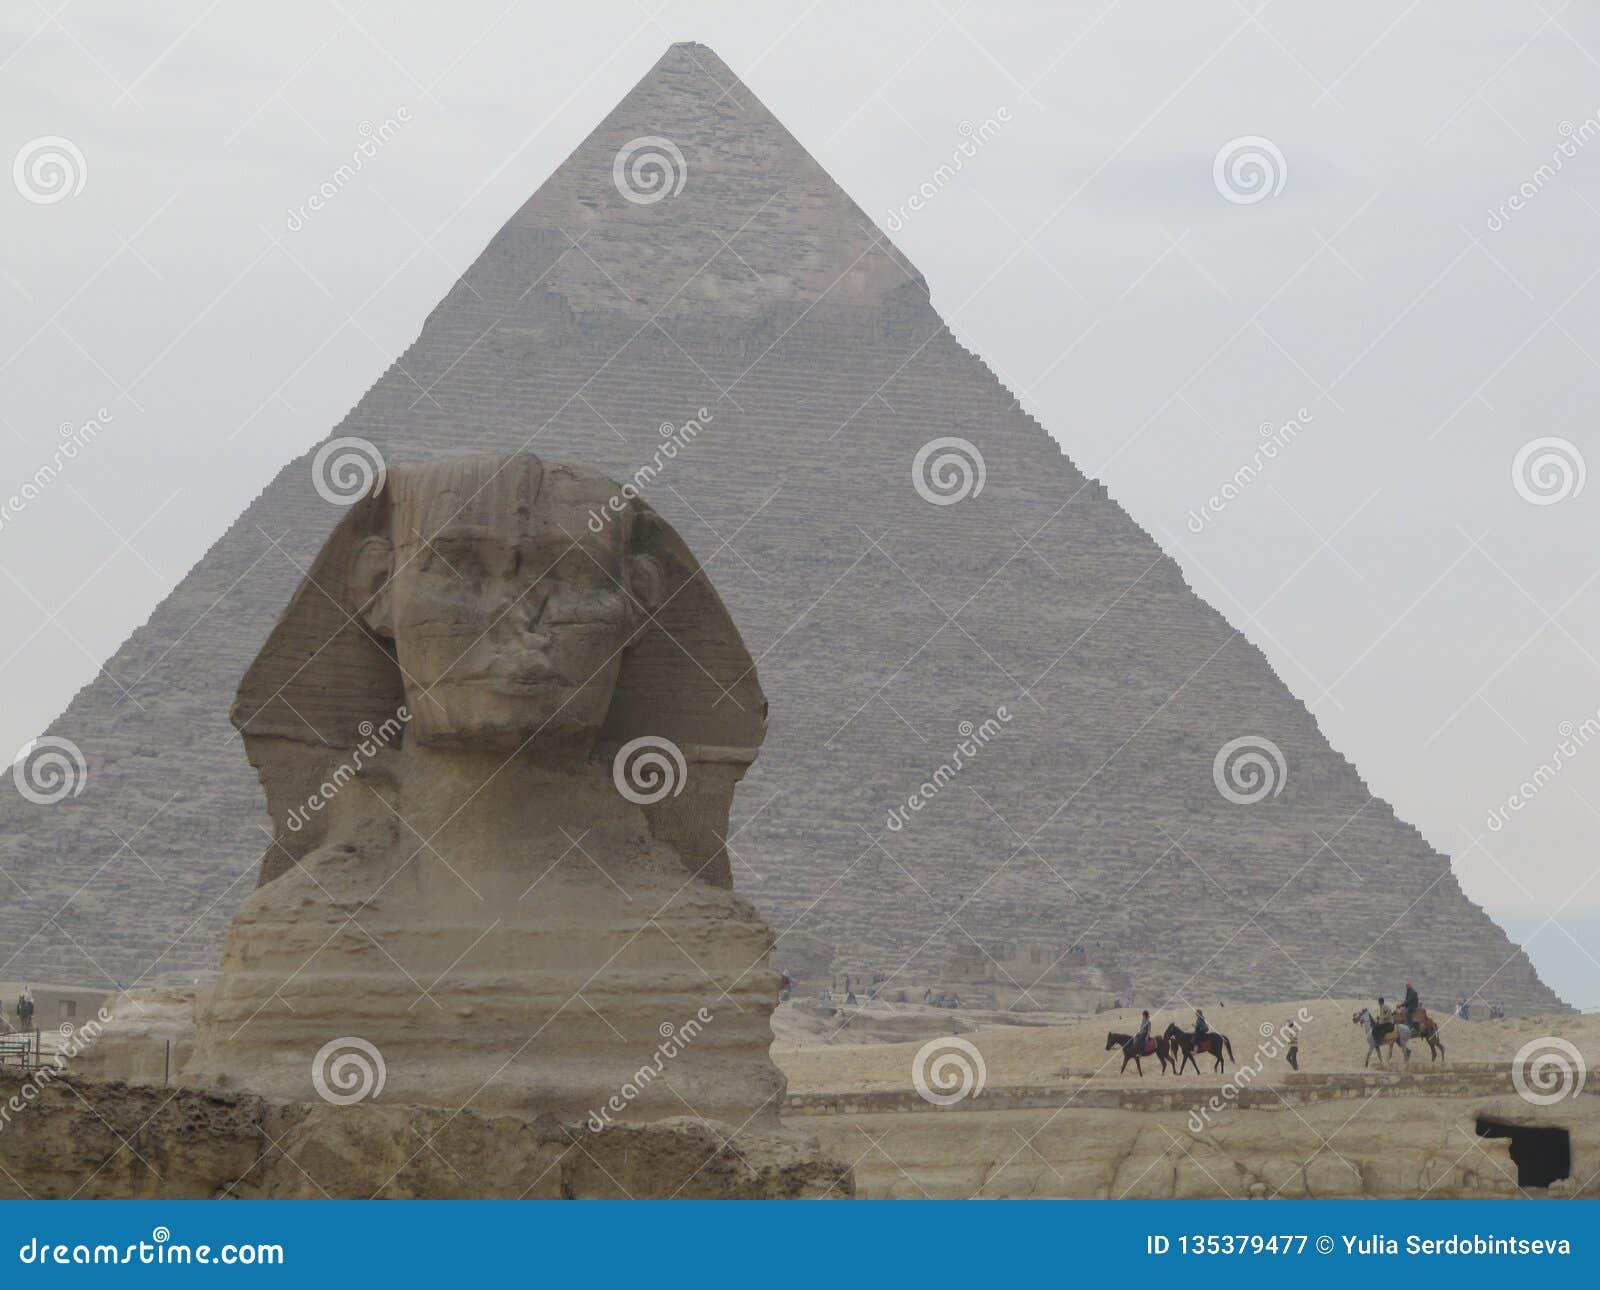 Esfinge na frente da pirâmide em Egito Complexo da pirâmide de Giza